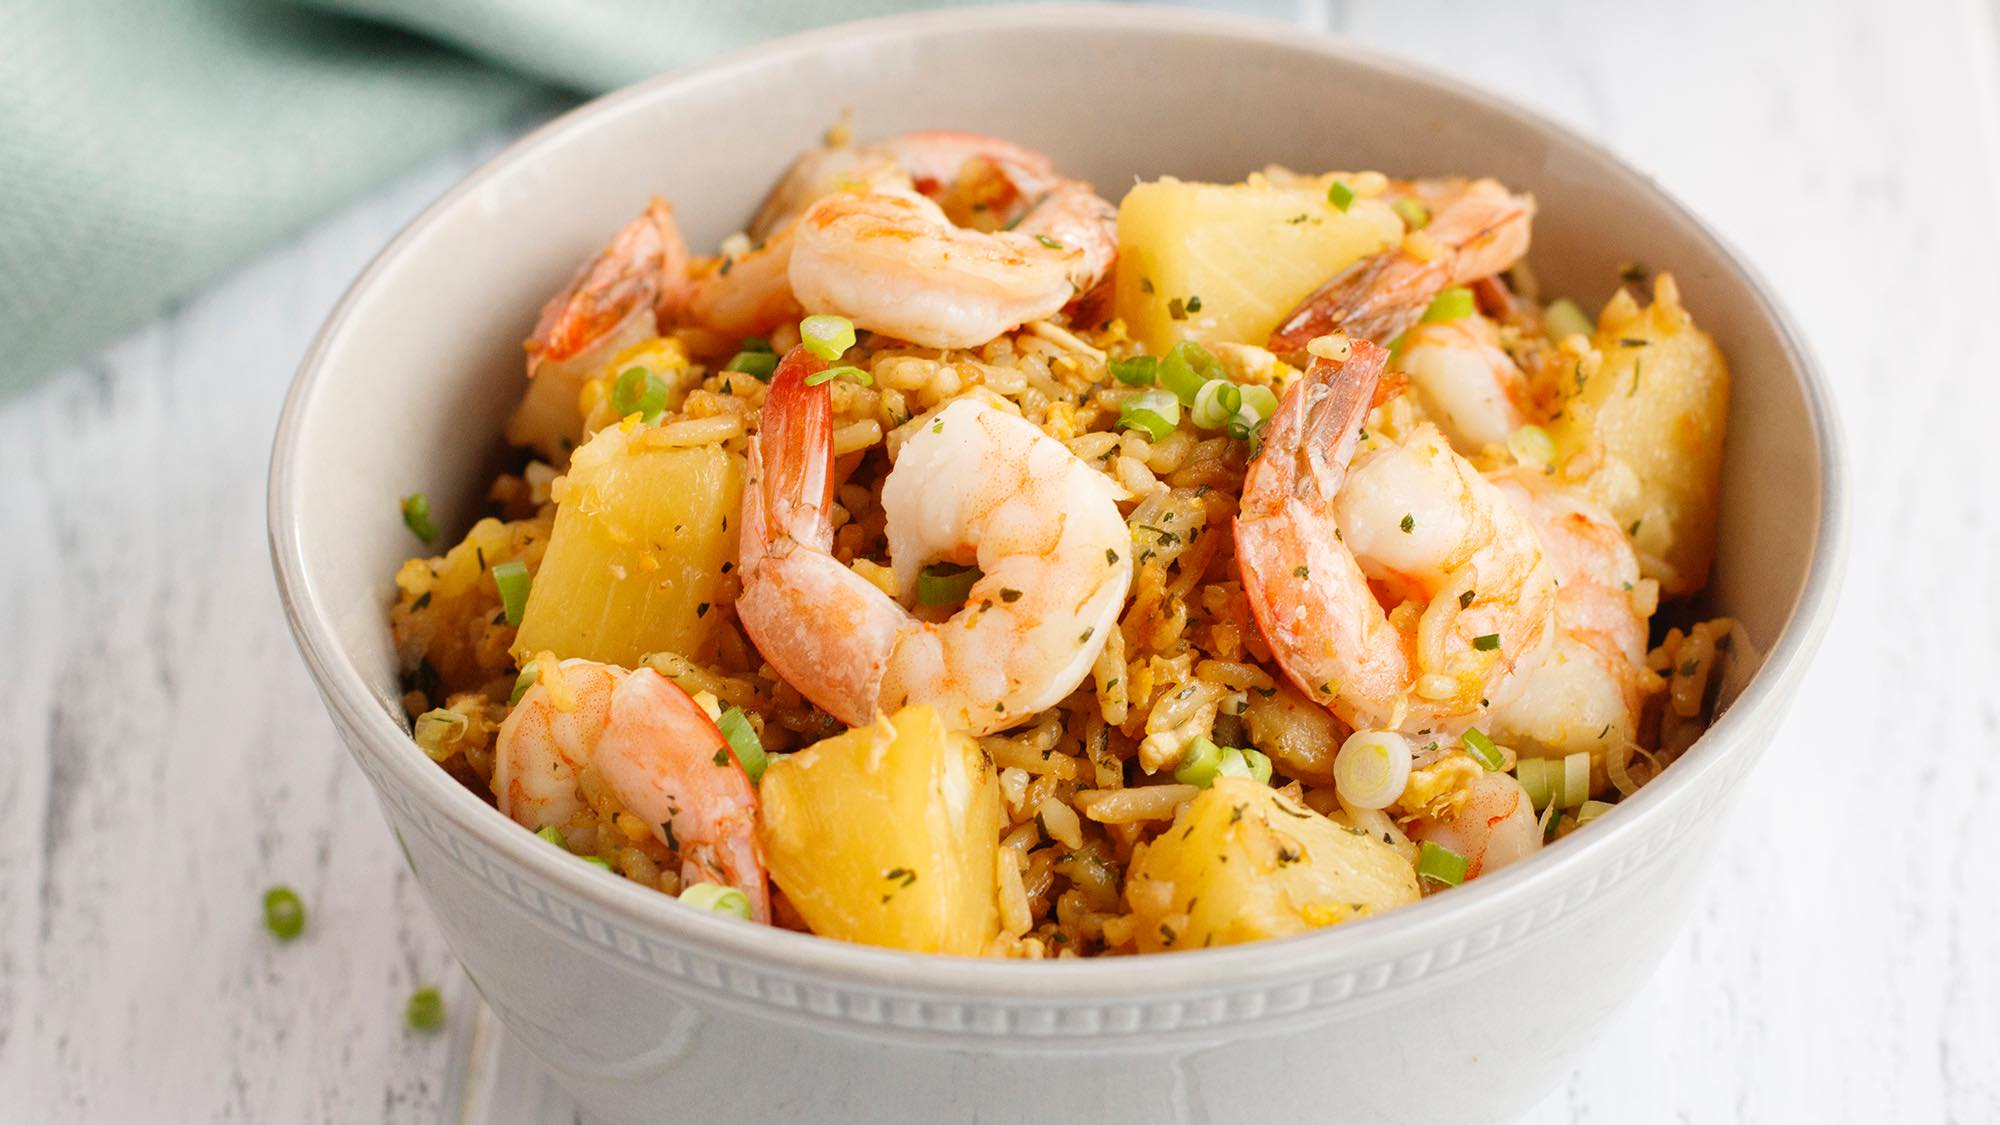 thai_pineapple_fried_rice_recipes_2000x1125.jpg